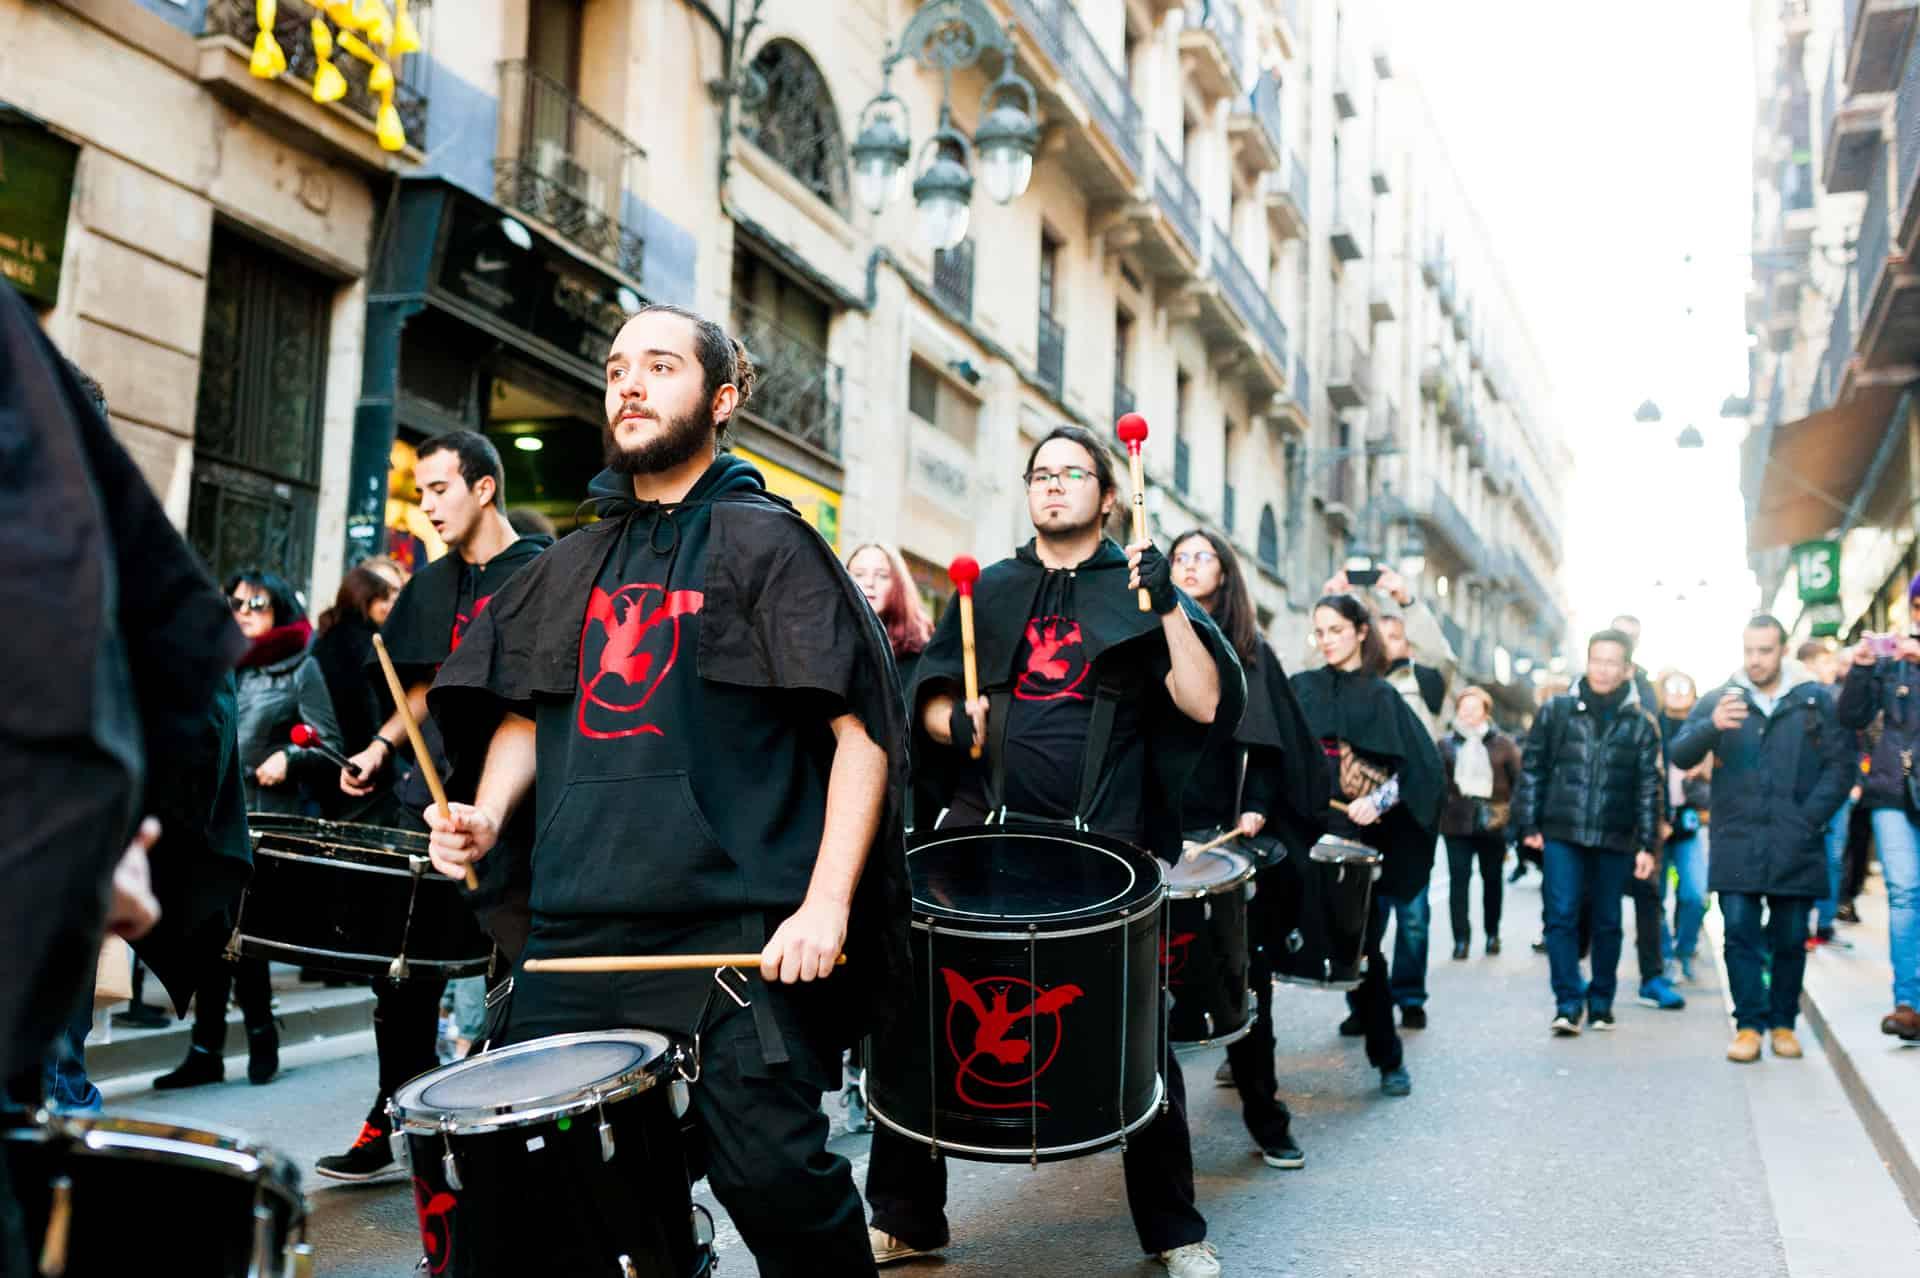 Barcelona Carnival Parade In February